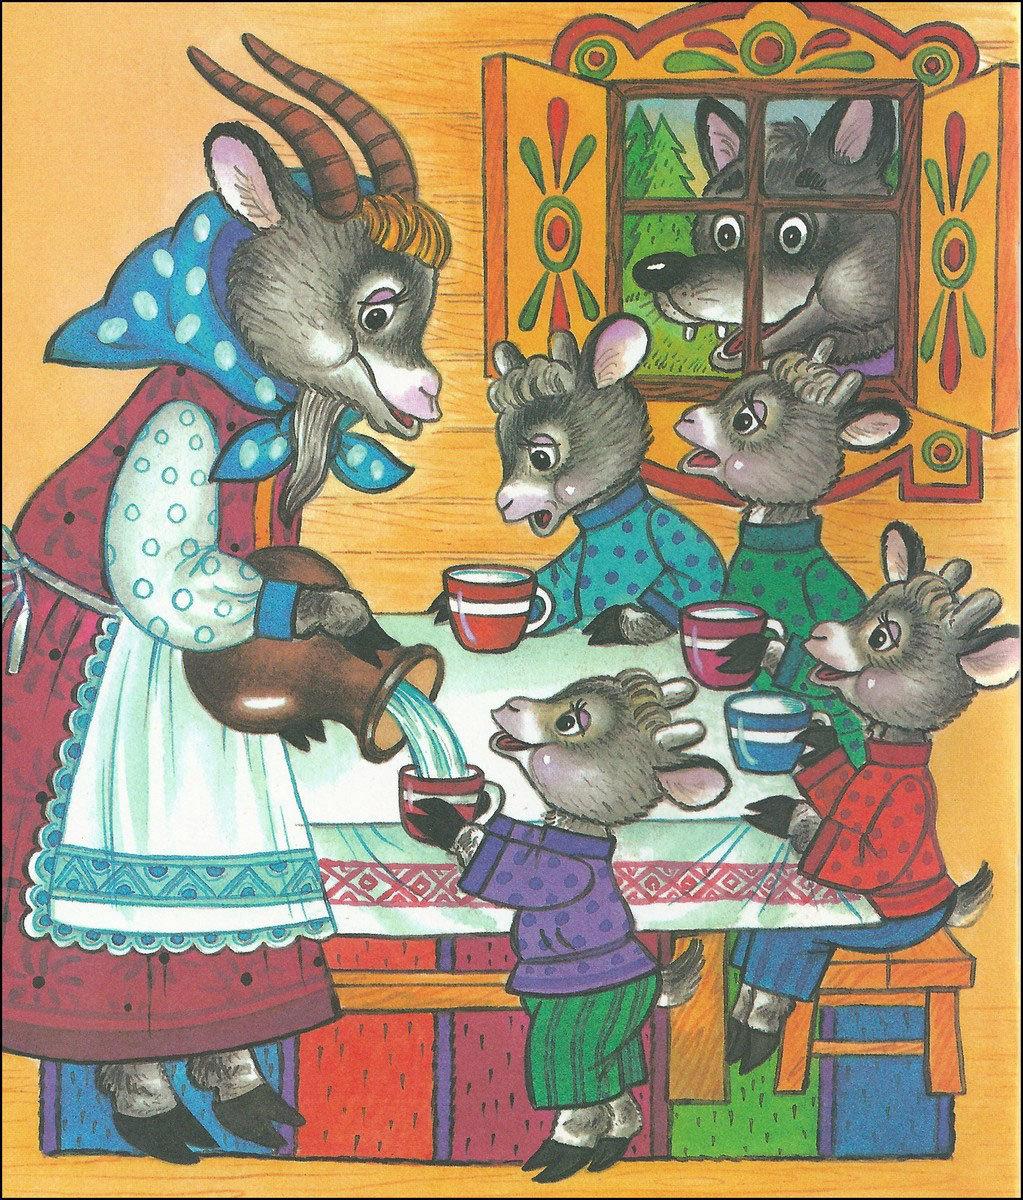 сегодня, картинка козленка из сказки про семеро козлят обовязково привітай своїх